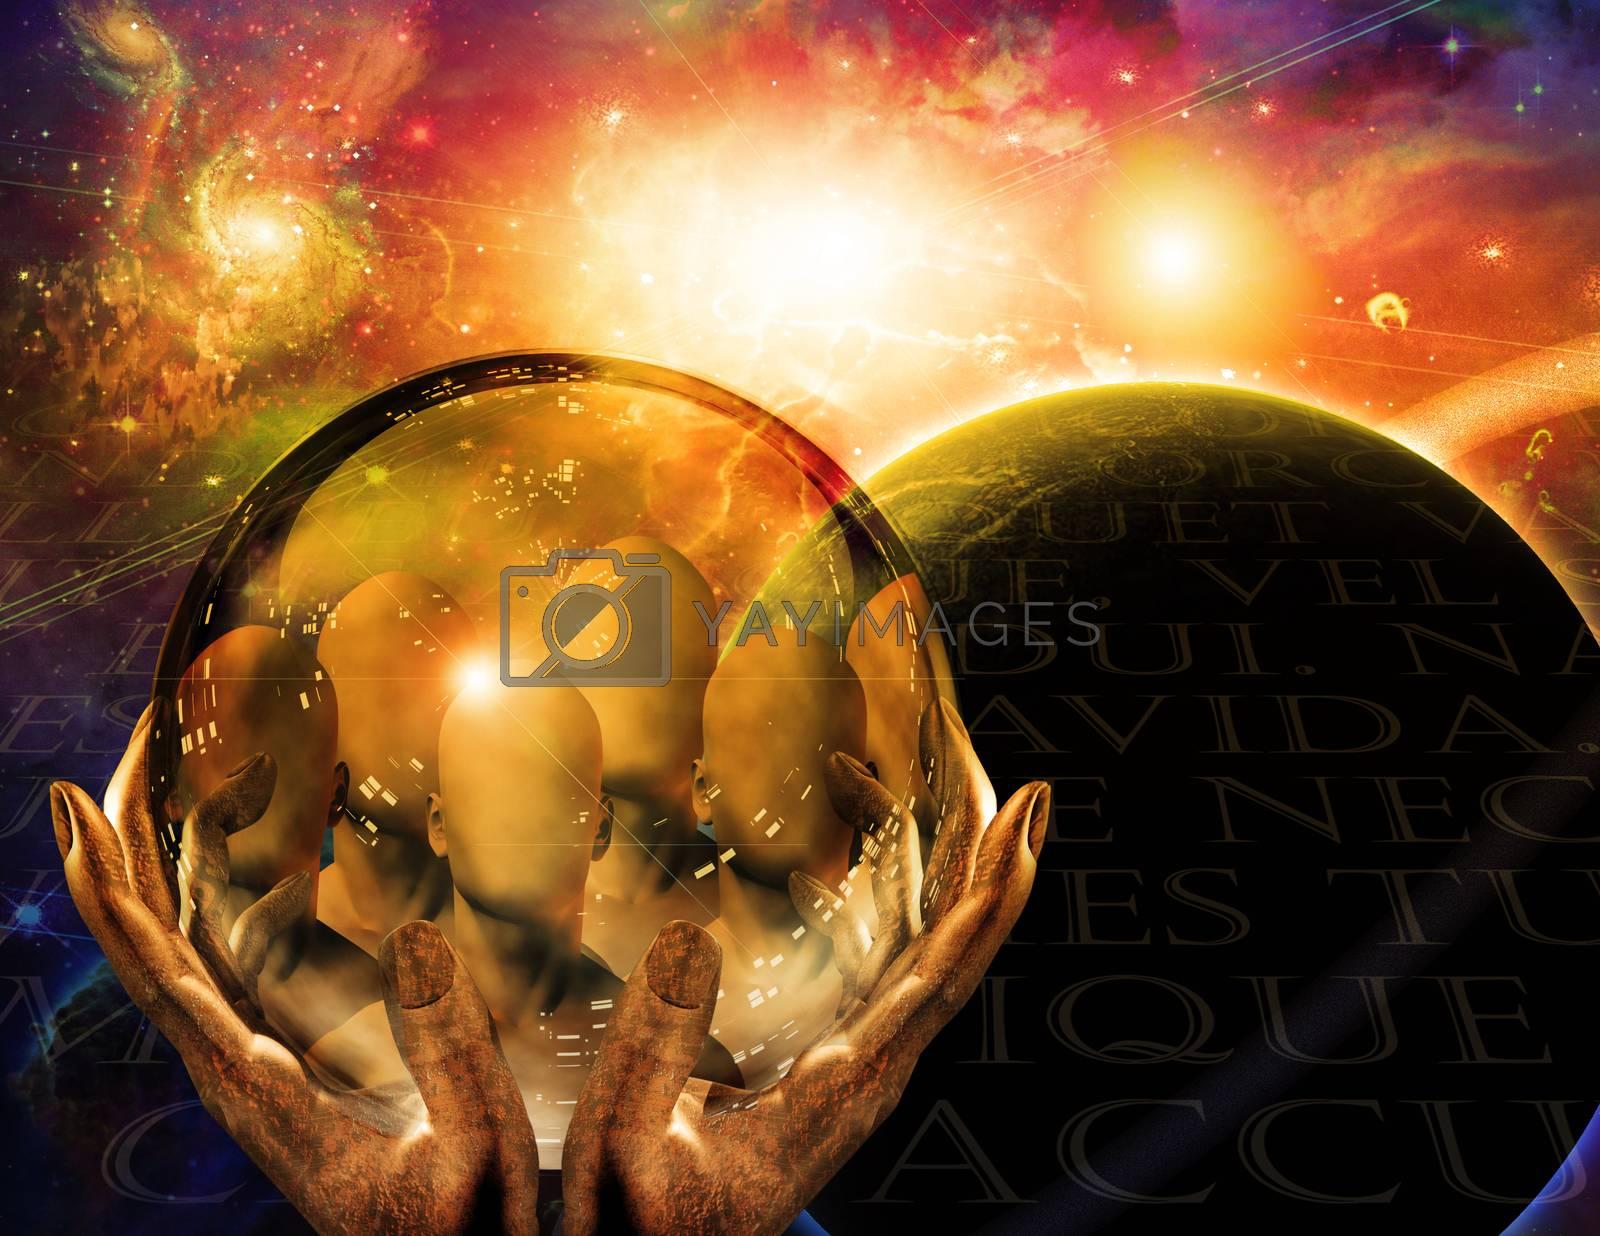 Seers vision in crystal ball